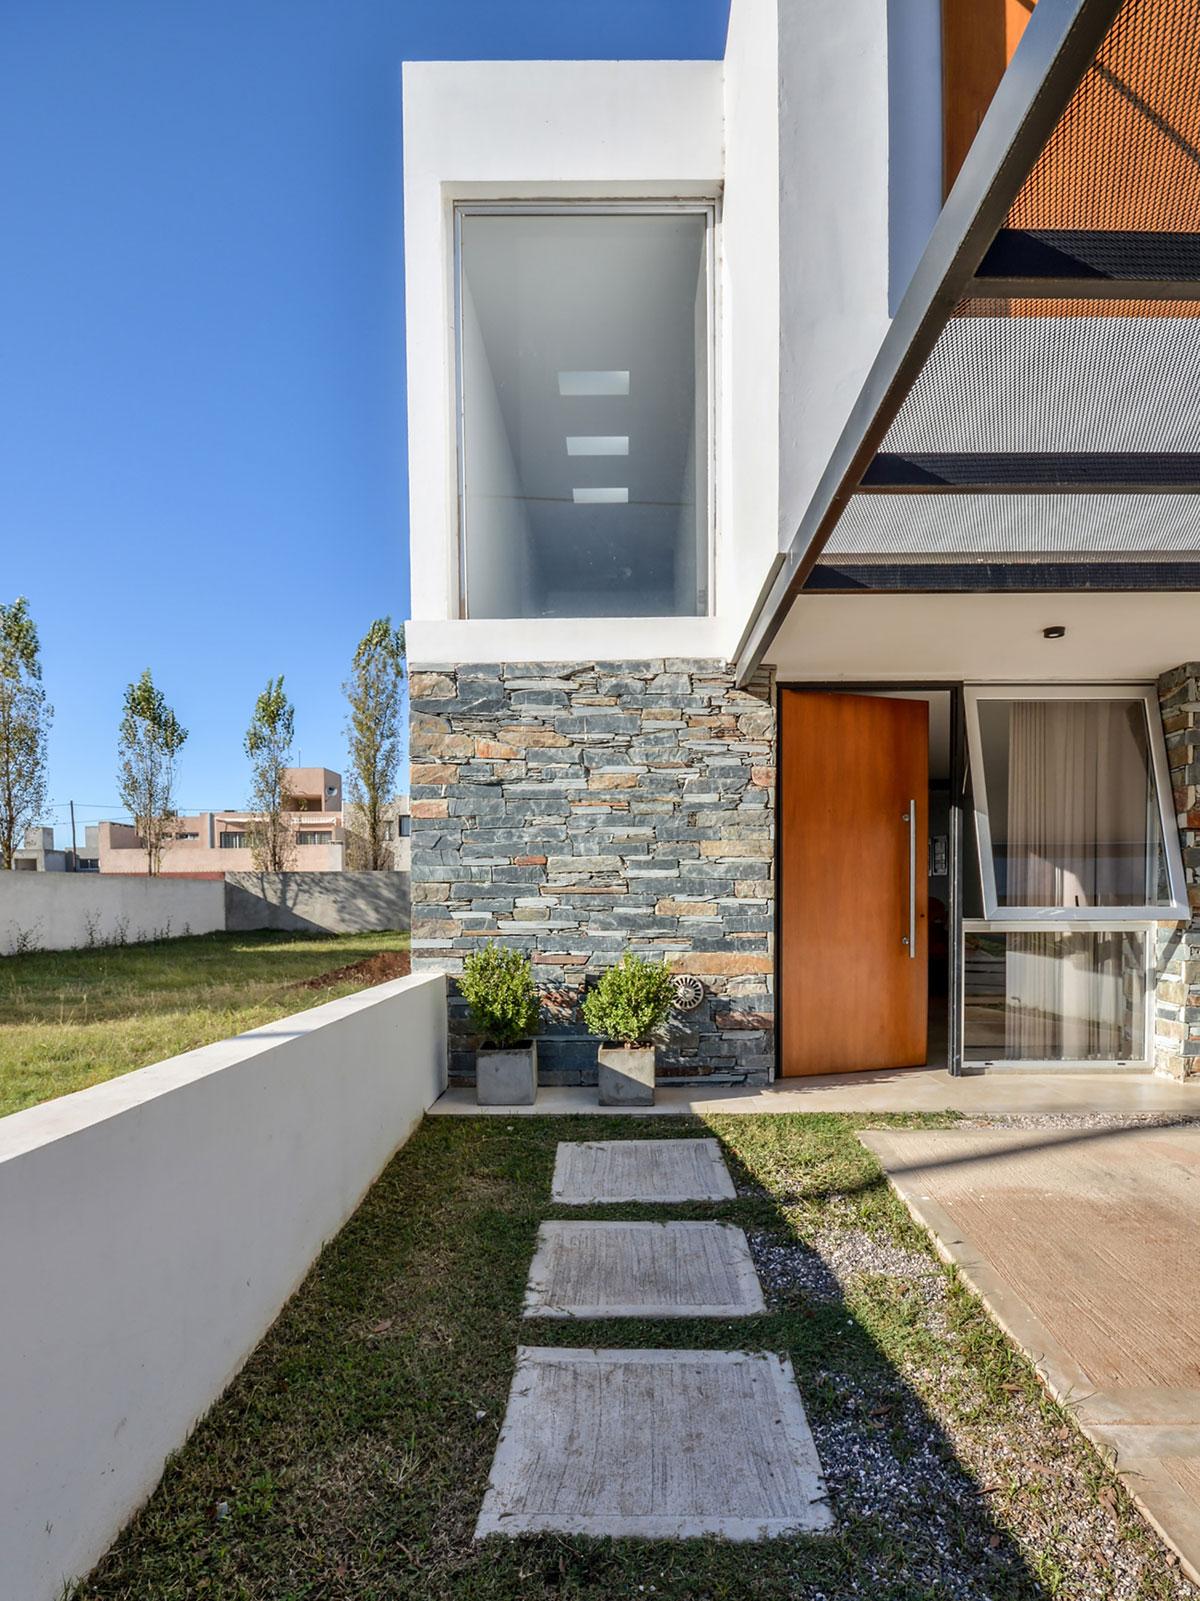 Terraced Houses-Estudio A+3-05